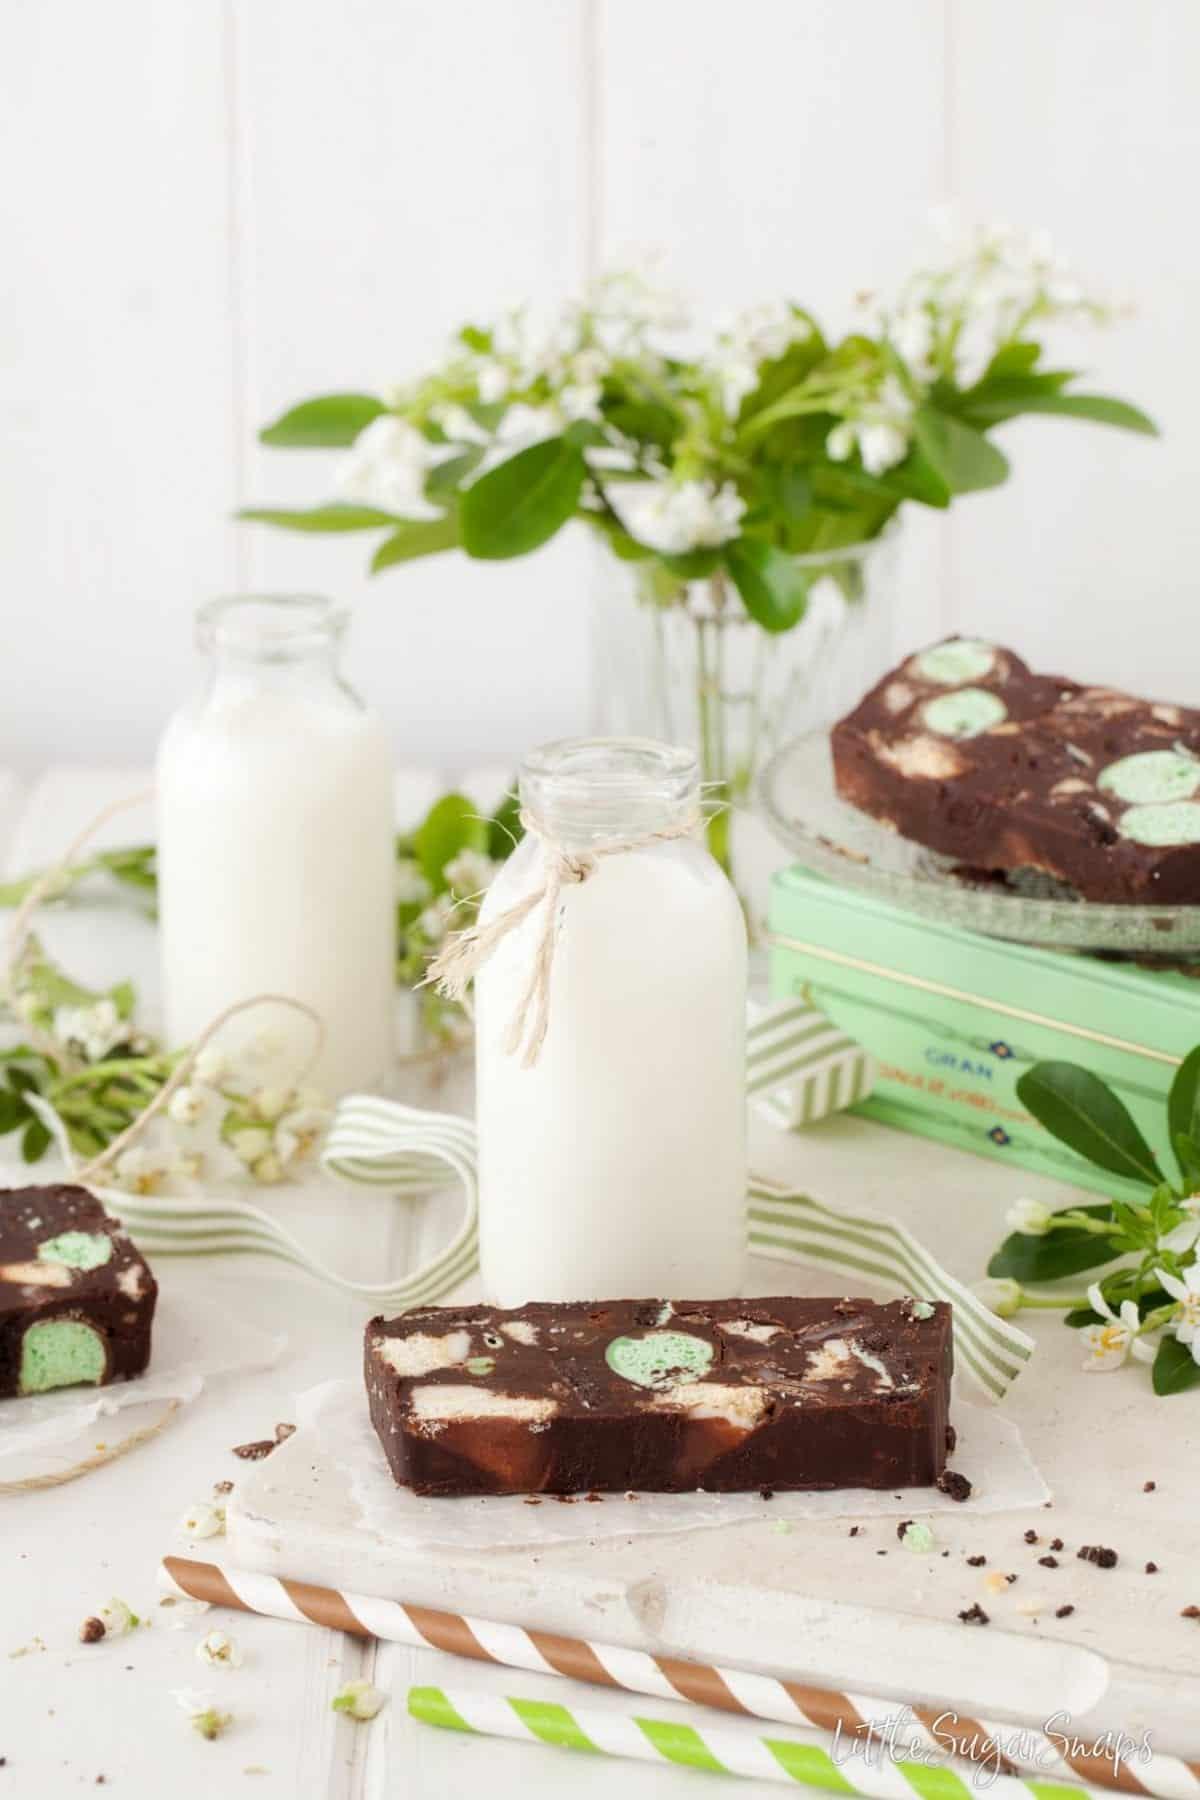 Mint Chocolate Fridge Cake served with milk.